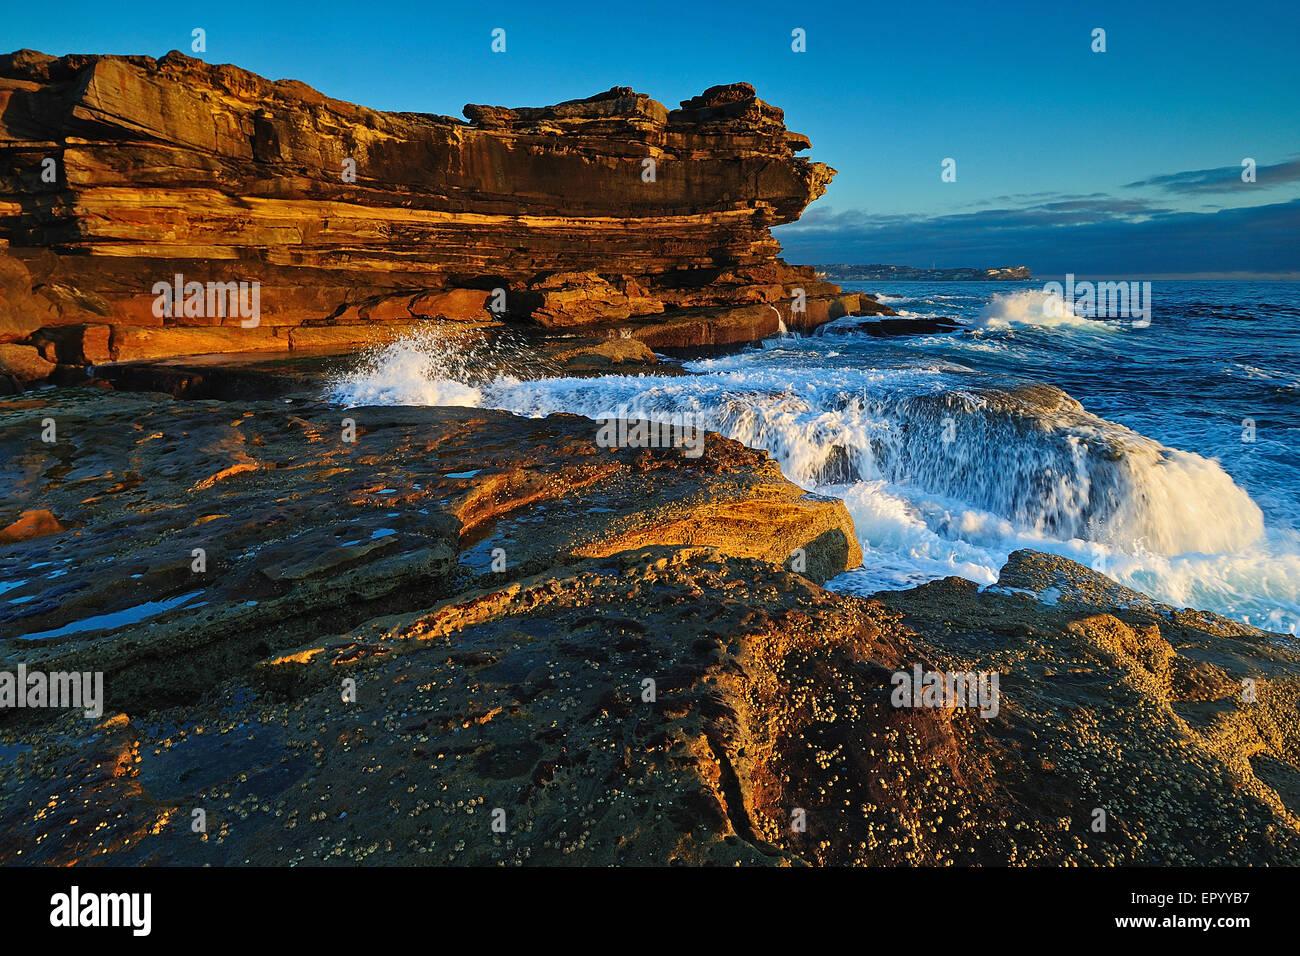 Ocean Pools Stock Photos & Ocean Pools Stock Images - Alamy